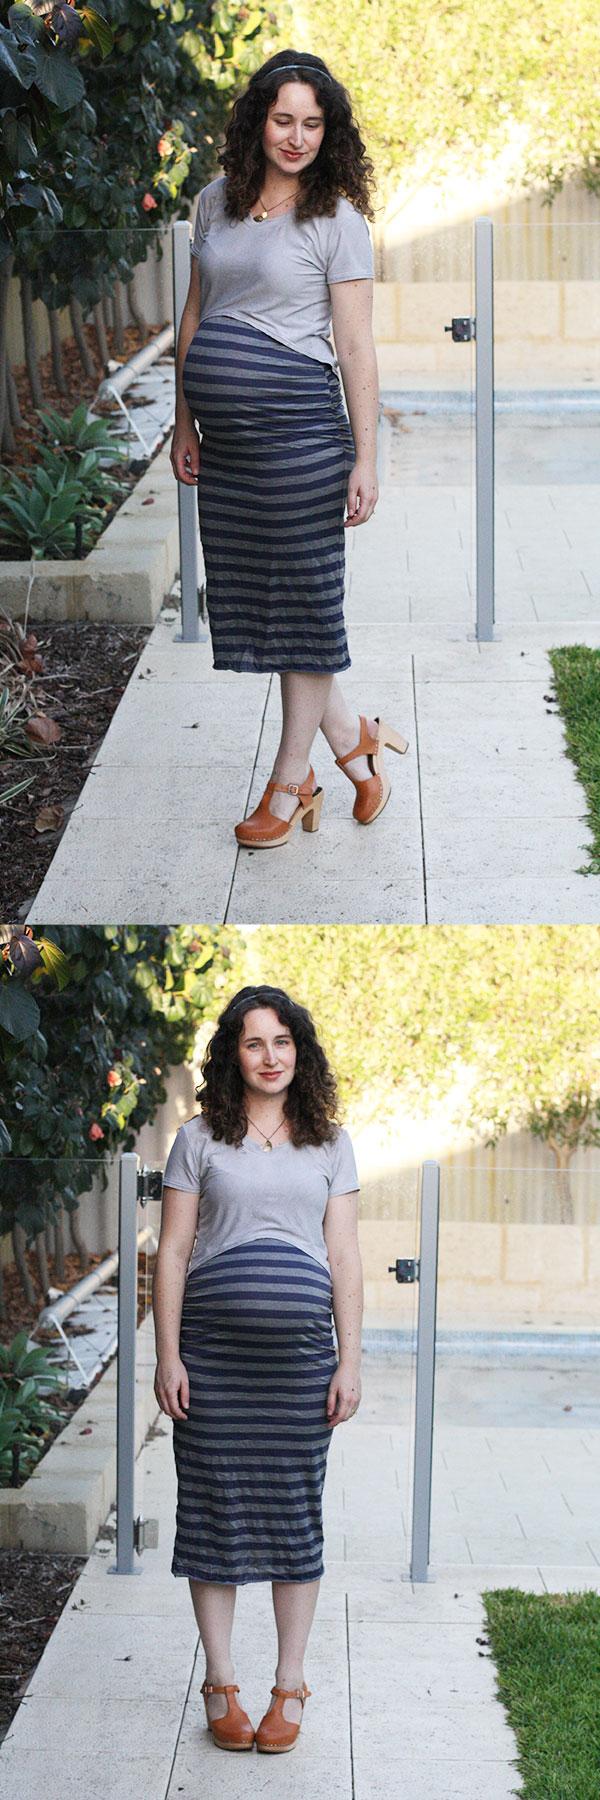 Megan Nielsen maternity style // Ruched midi skirt